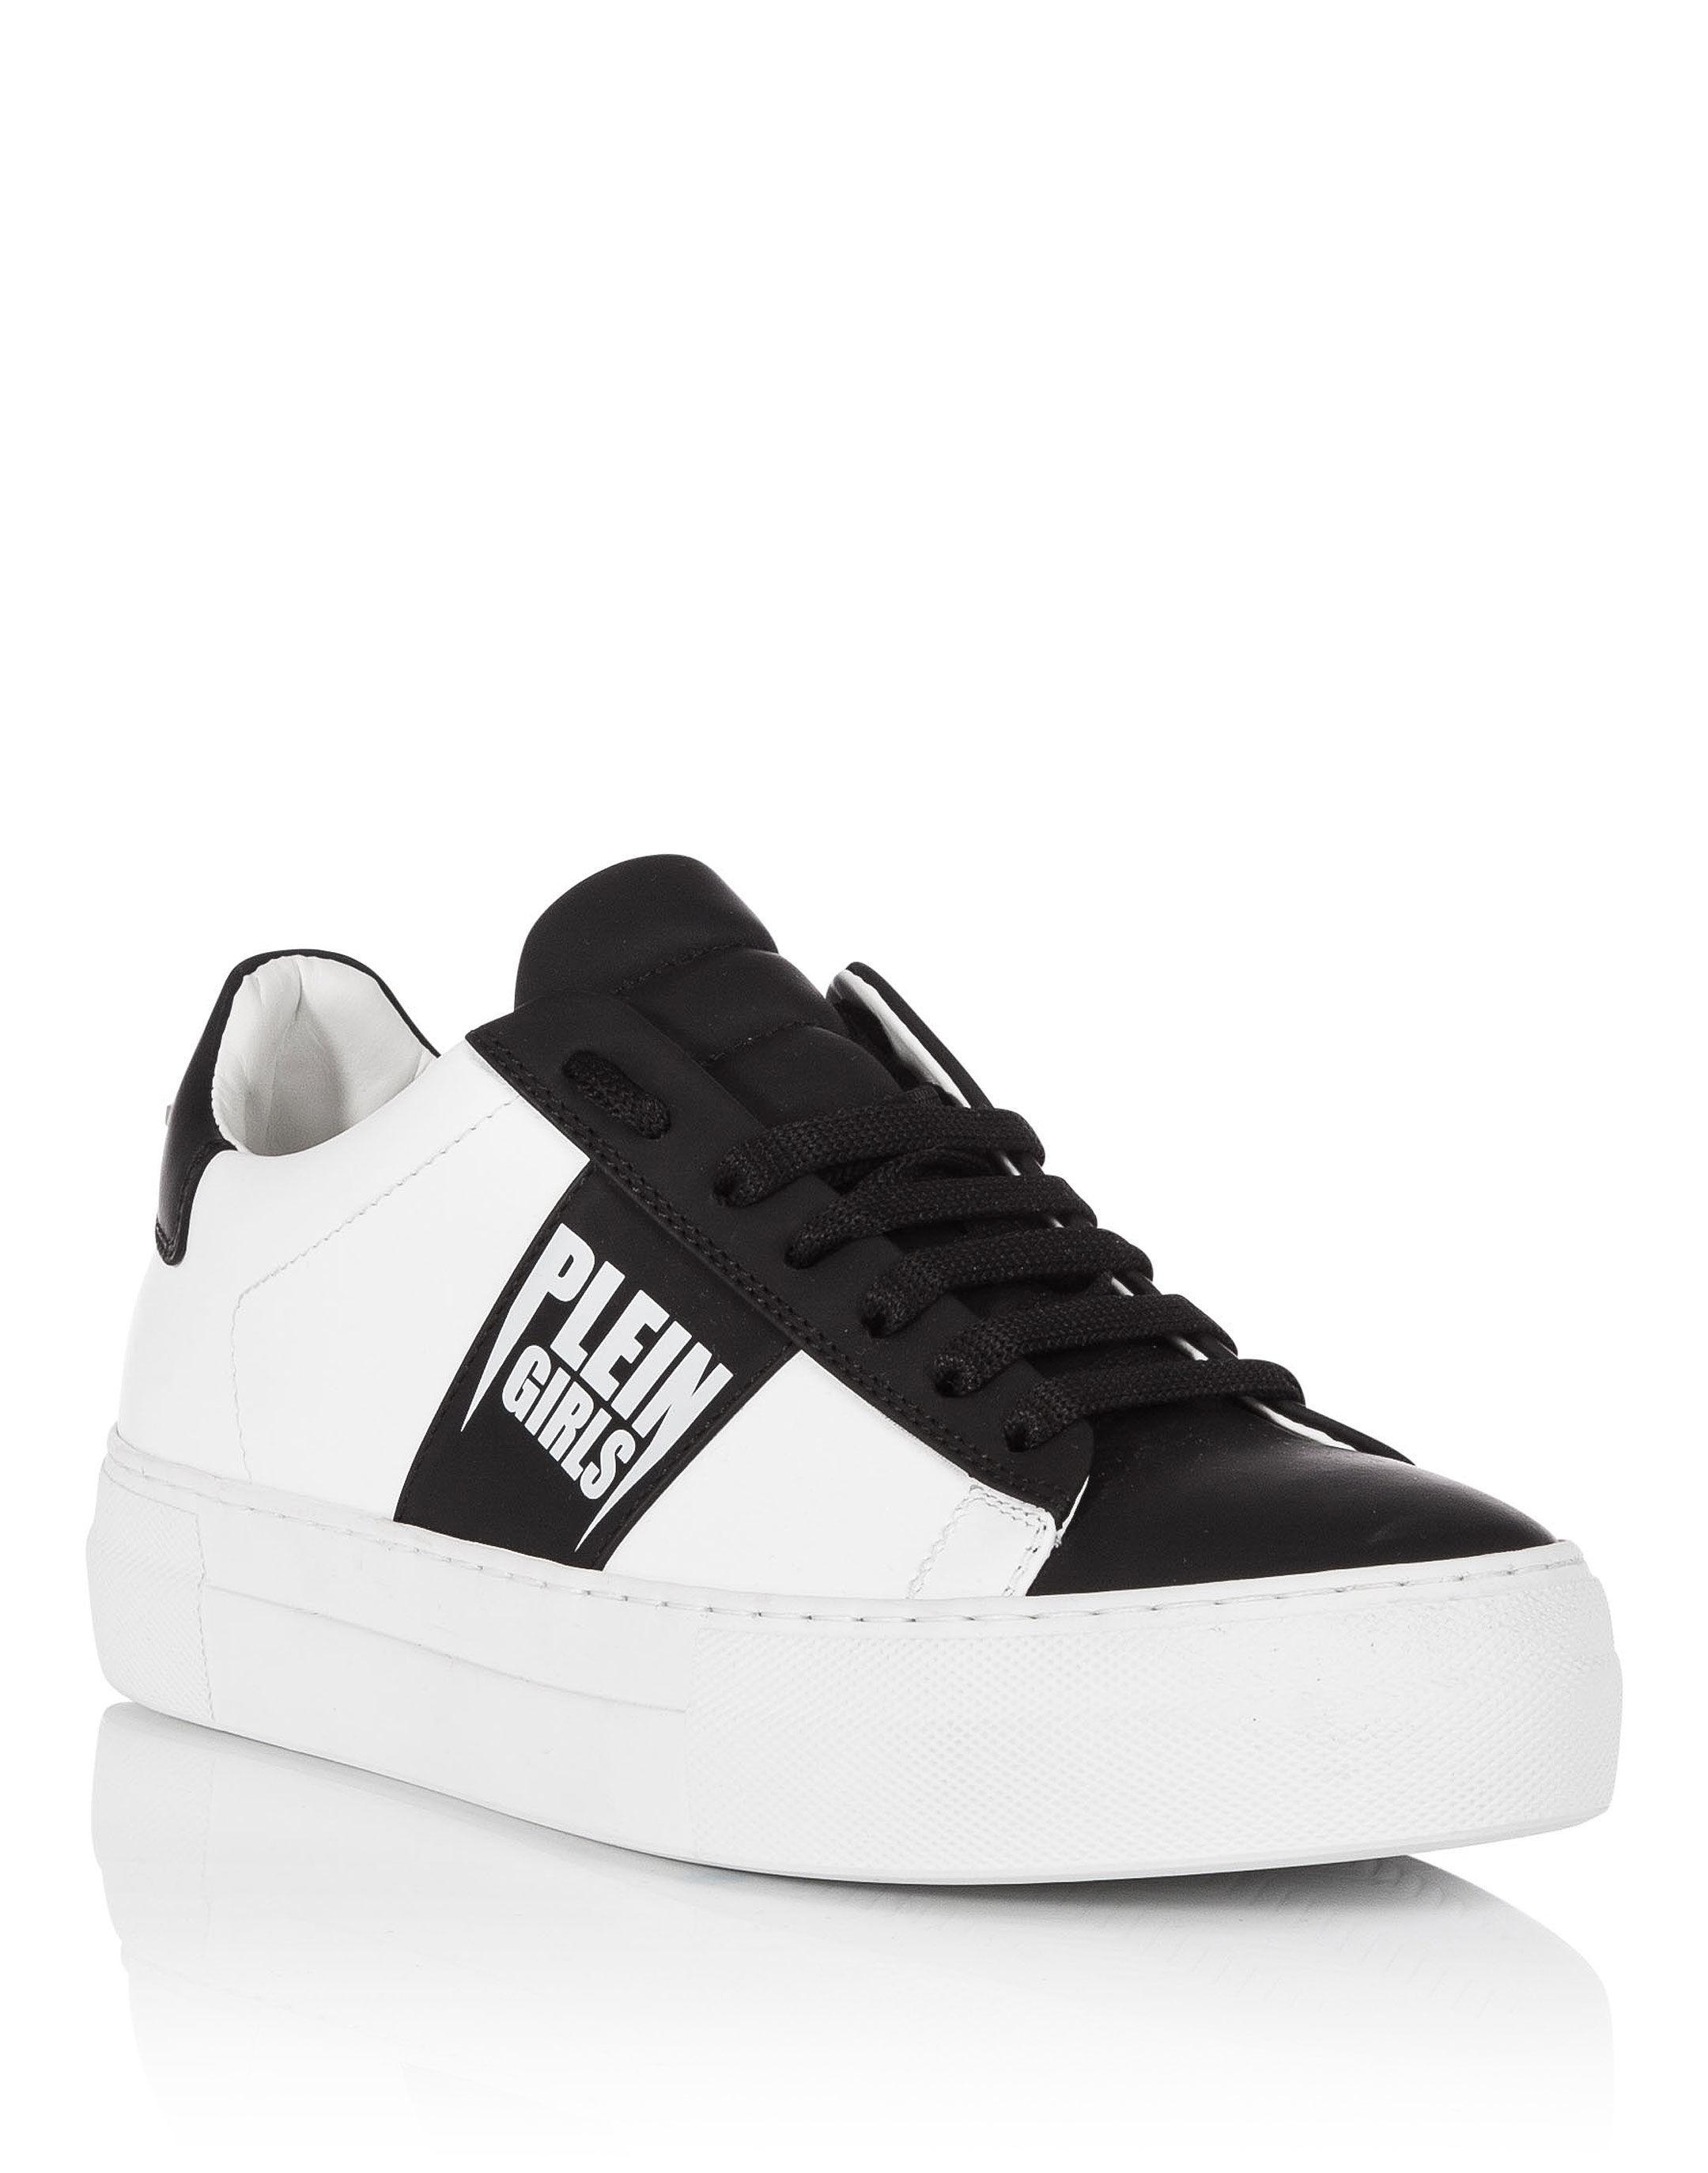 Jewels low-top sneakers - Black Philipp Plein gtoiPM